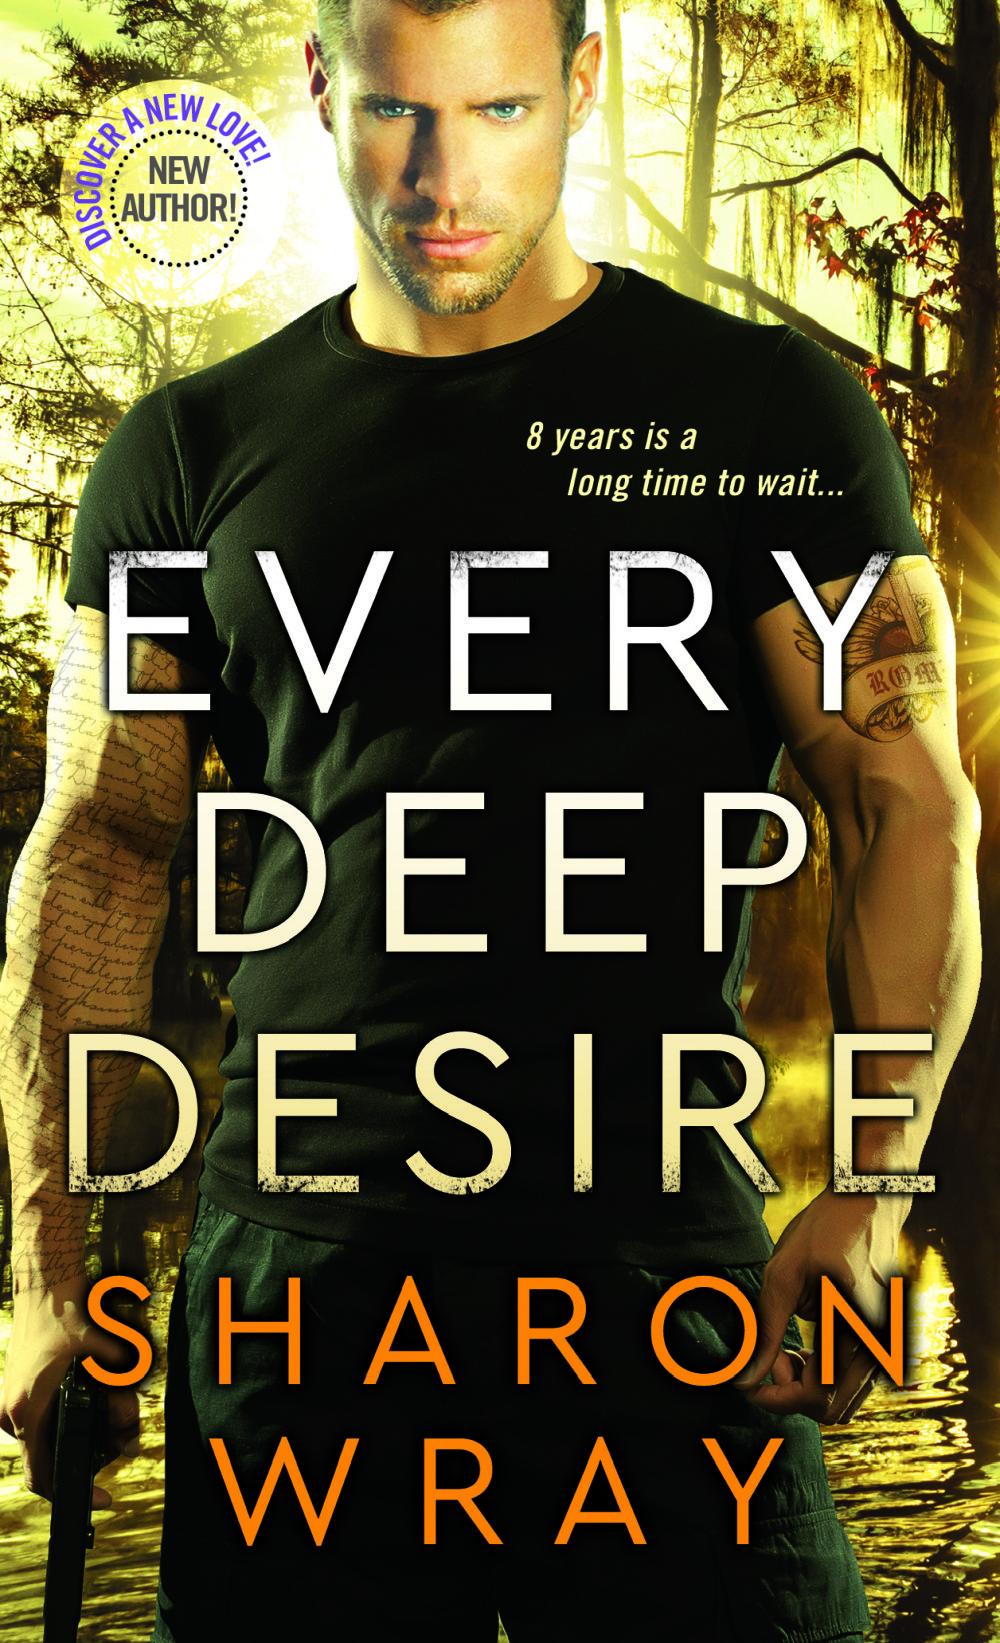 every-deep-desire-sharon-wray cover.jpg